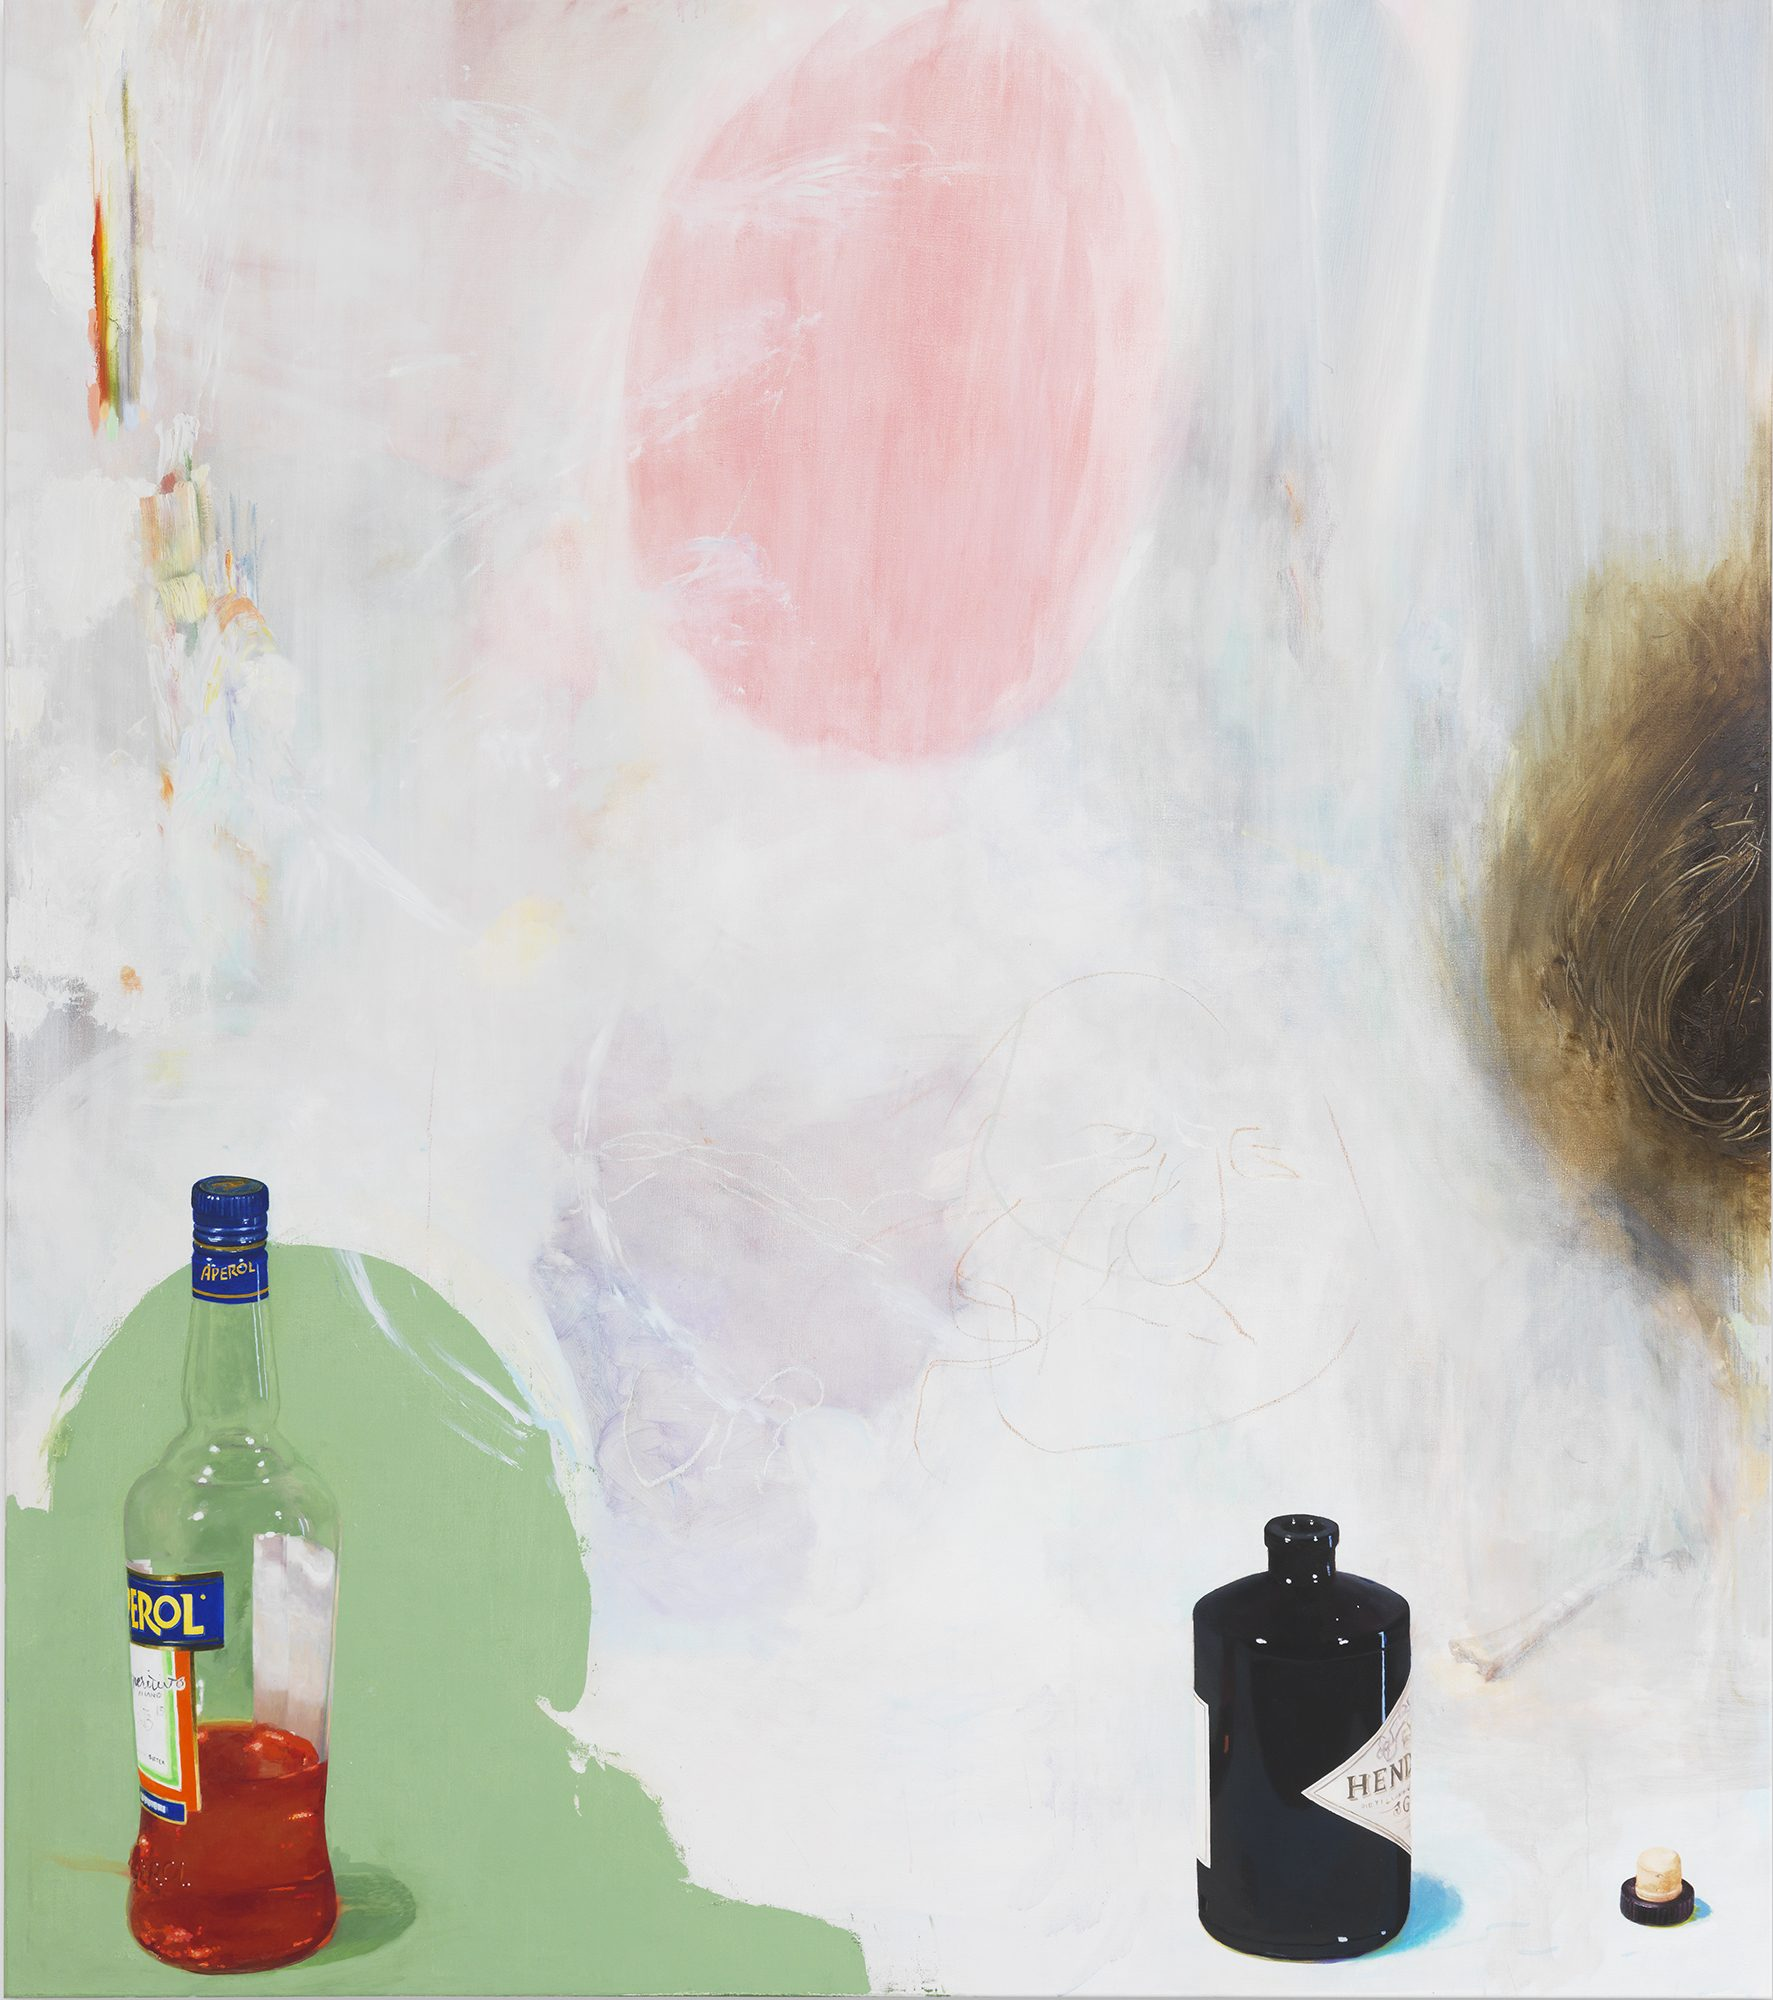 Monika Baer (German, b. 1964) L, 2014. Oil on canvas, 98 5/8 x 86 3/4 x 2 in. Museum purchase, Wachenheim Family Fund, M.2014.16